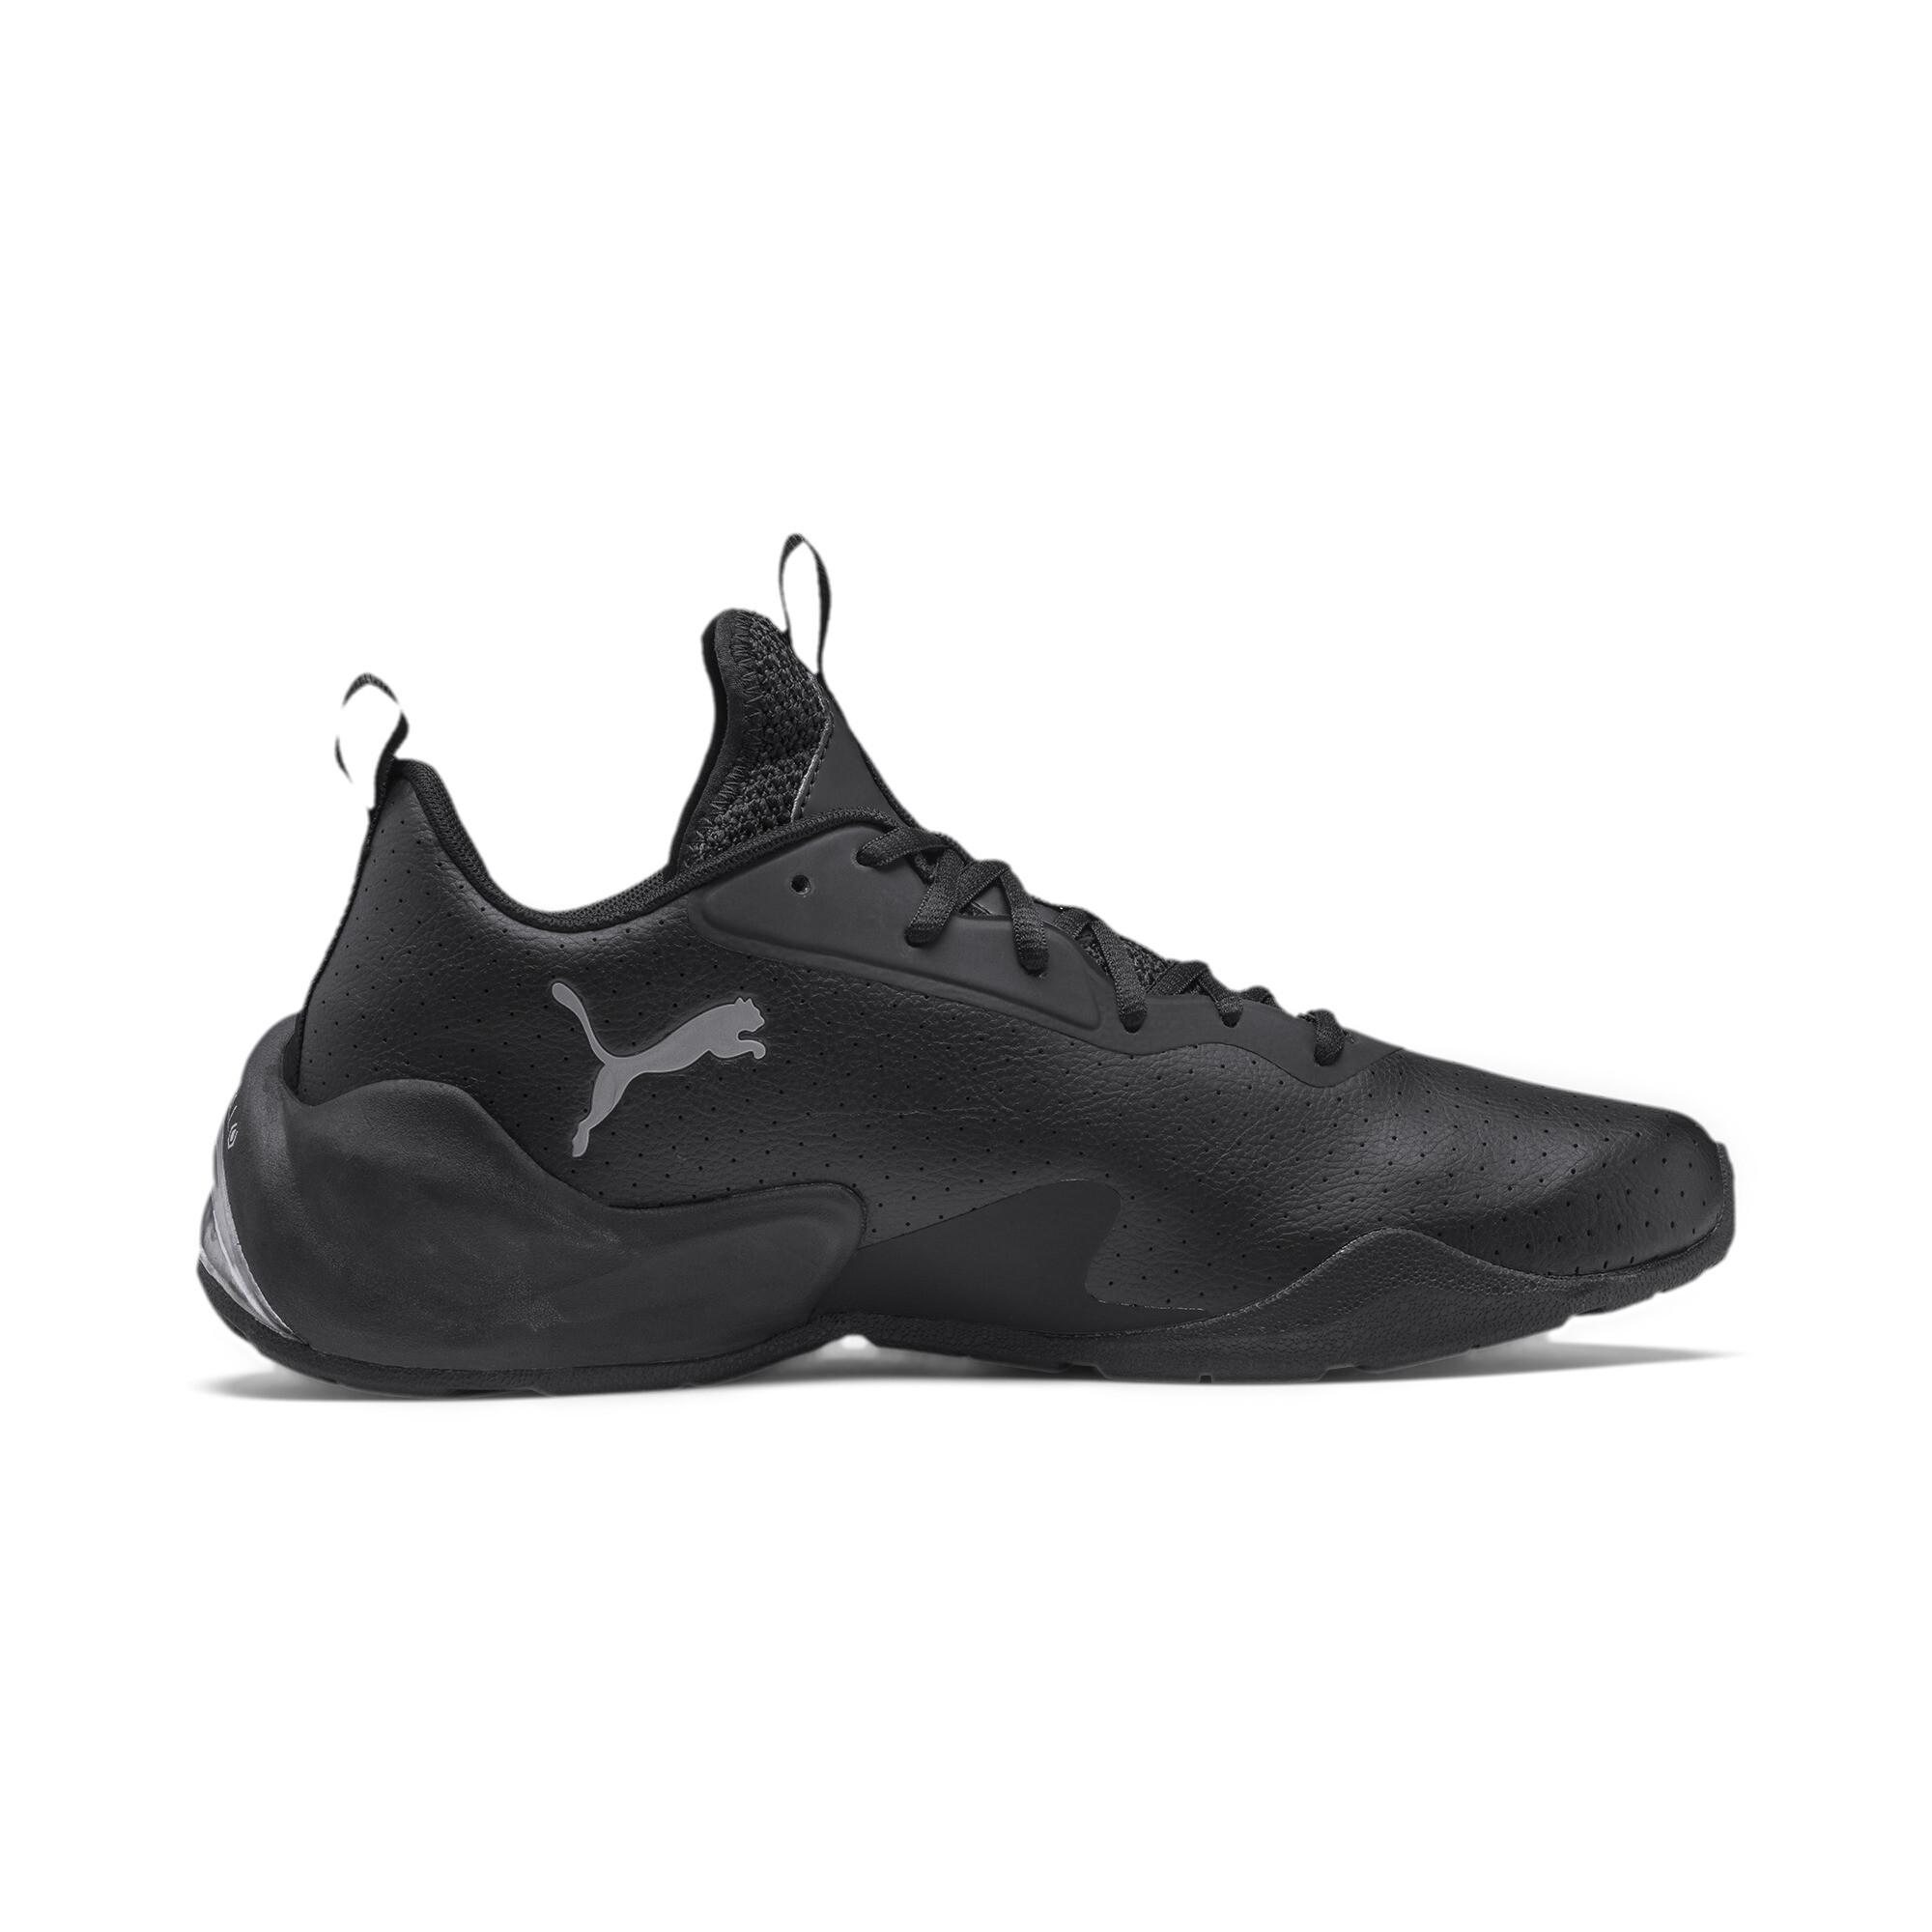 PUMA-Men-039-s-LQDCELL-Challenge-Perf-Training-Shoes thumbnail 14